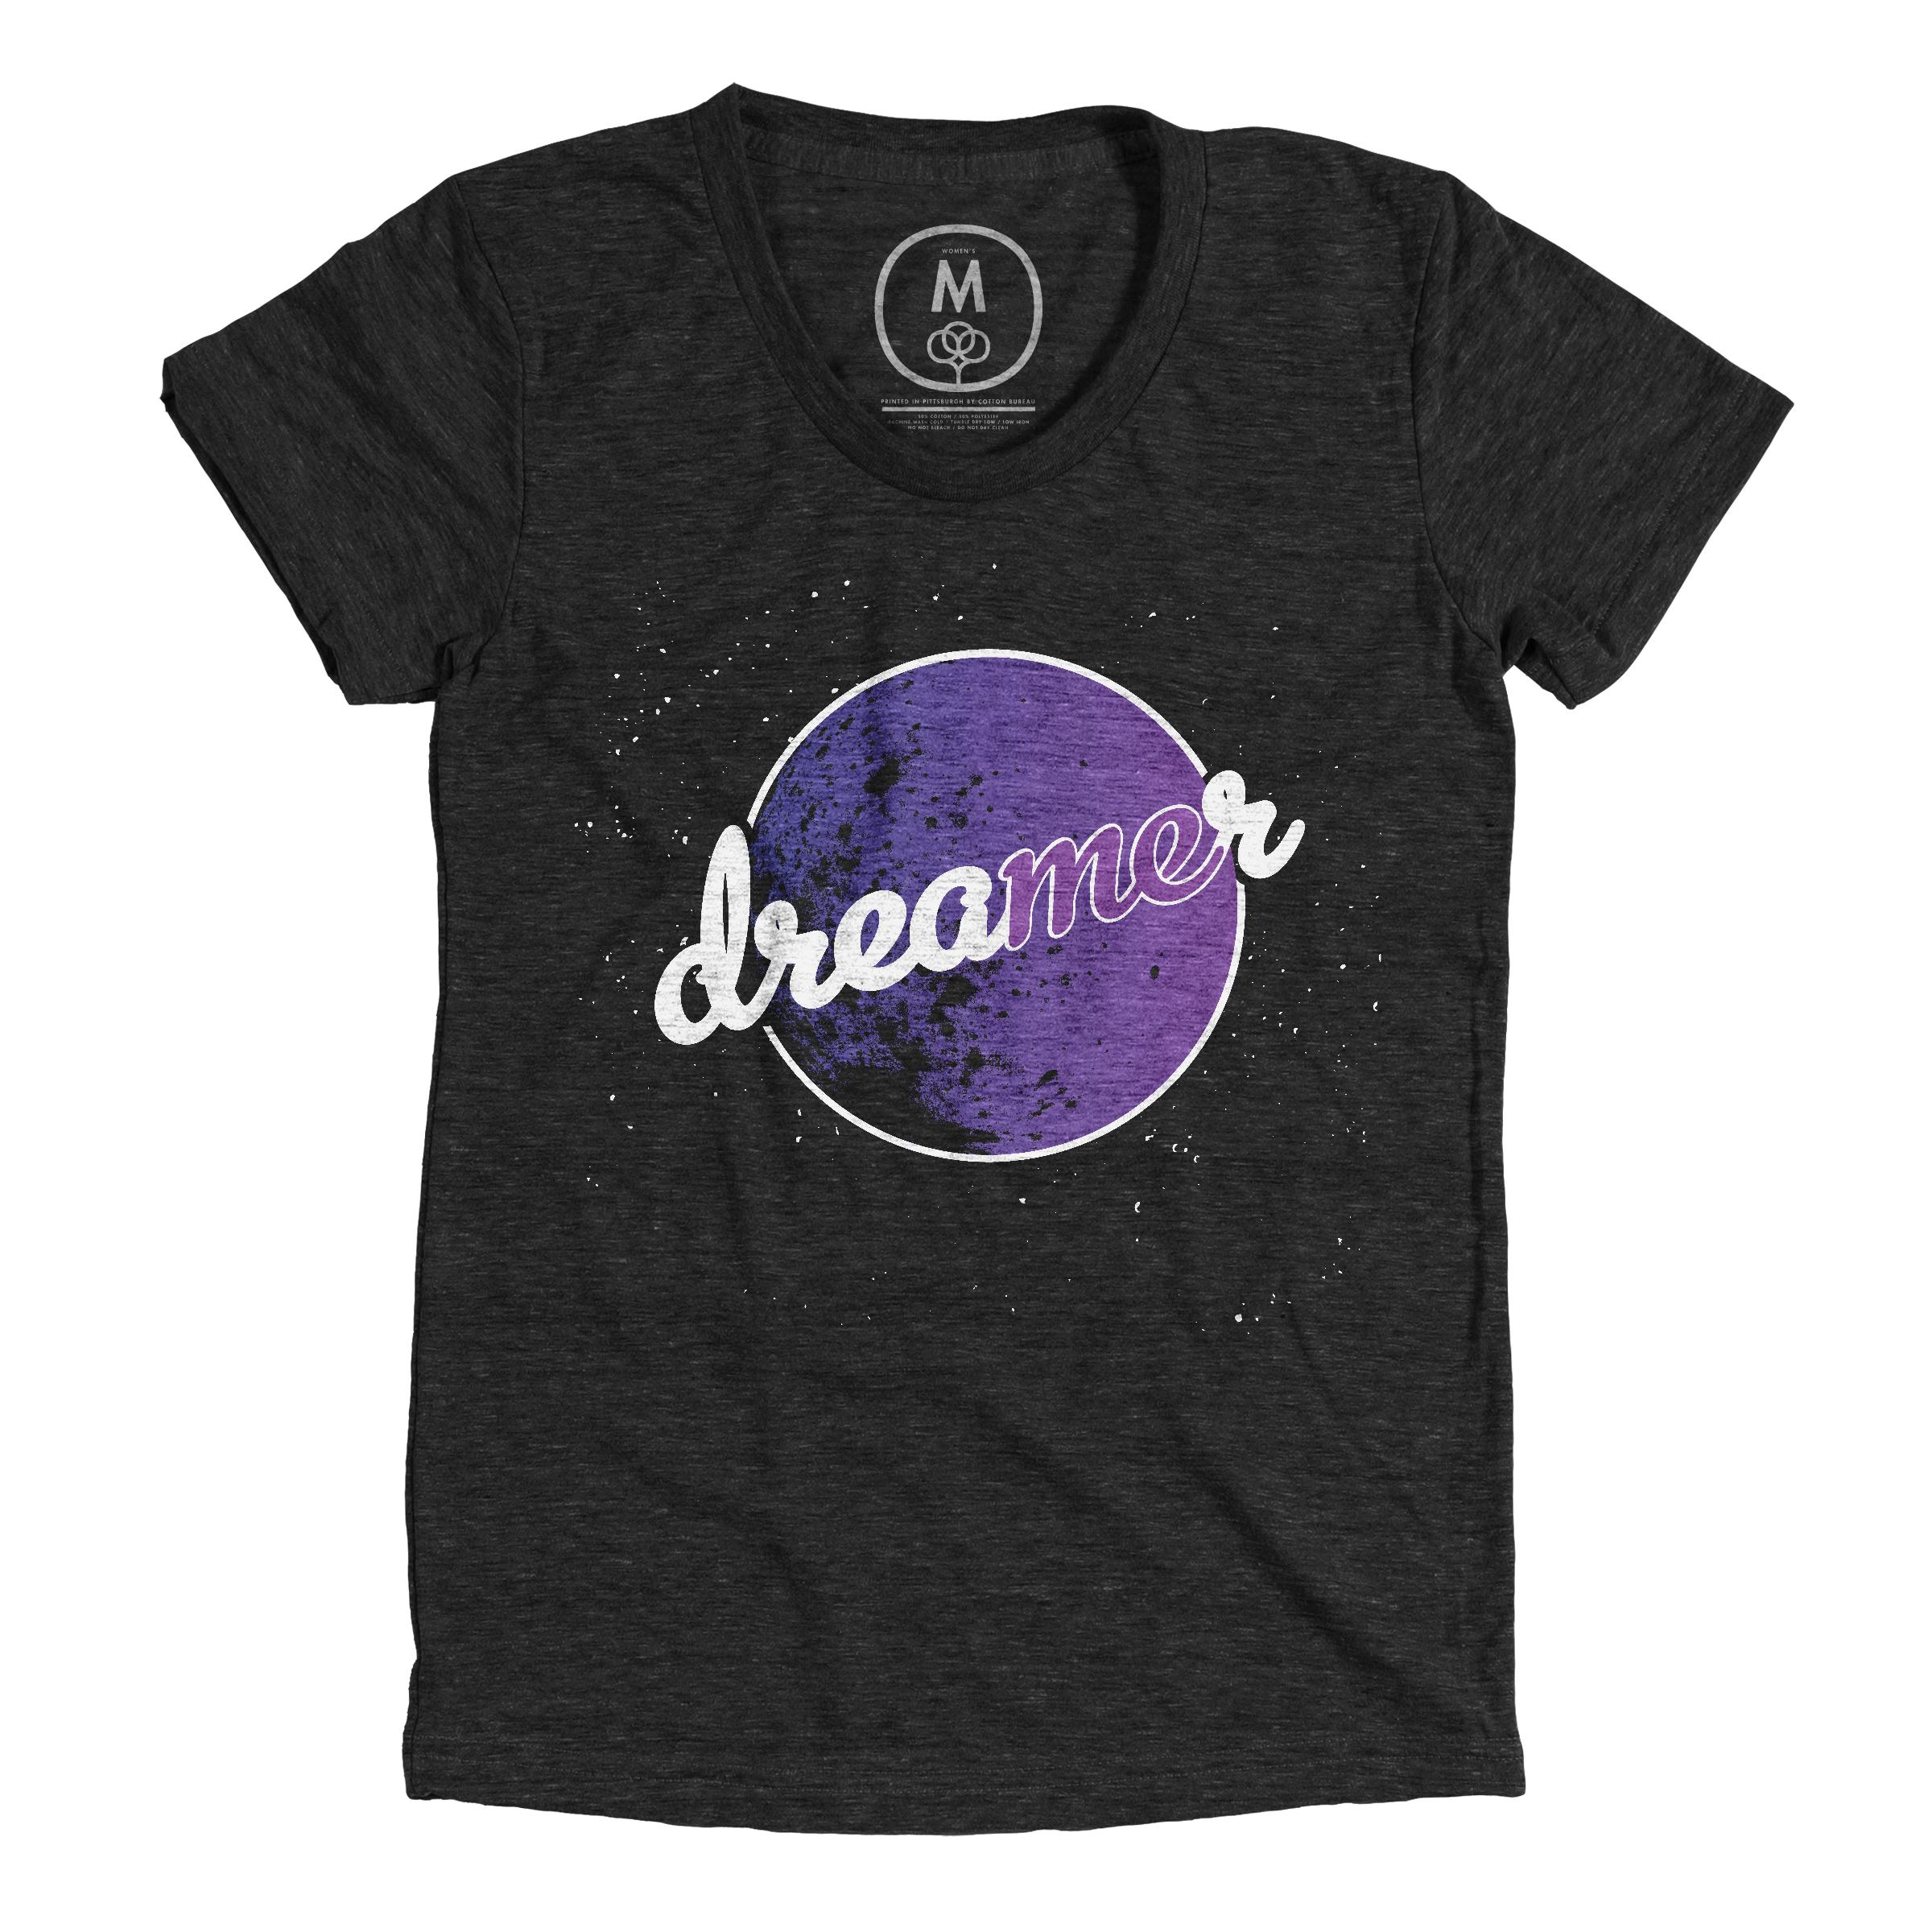 The Dreamer in Me Vintage Black (Women's)